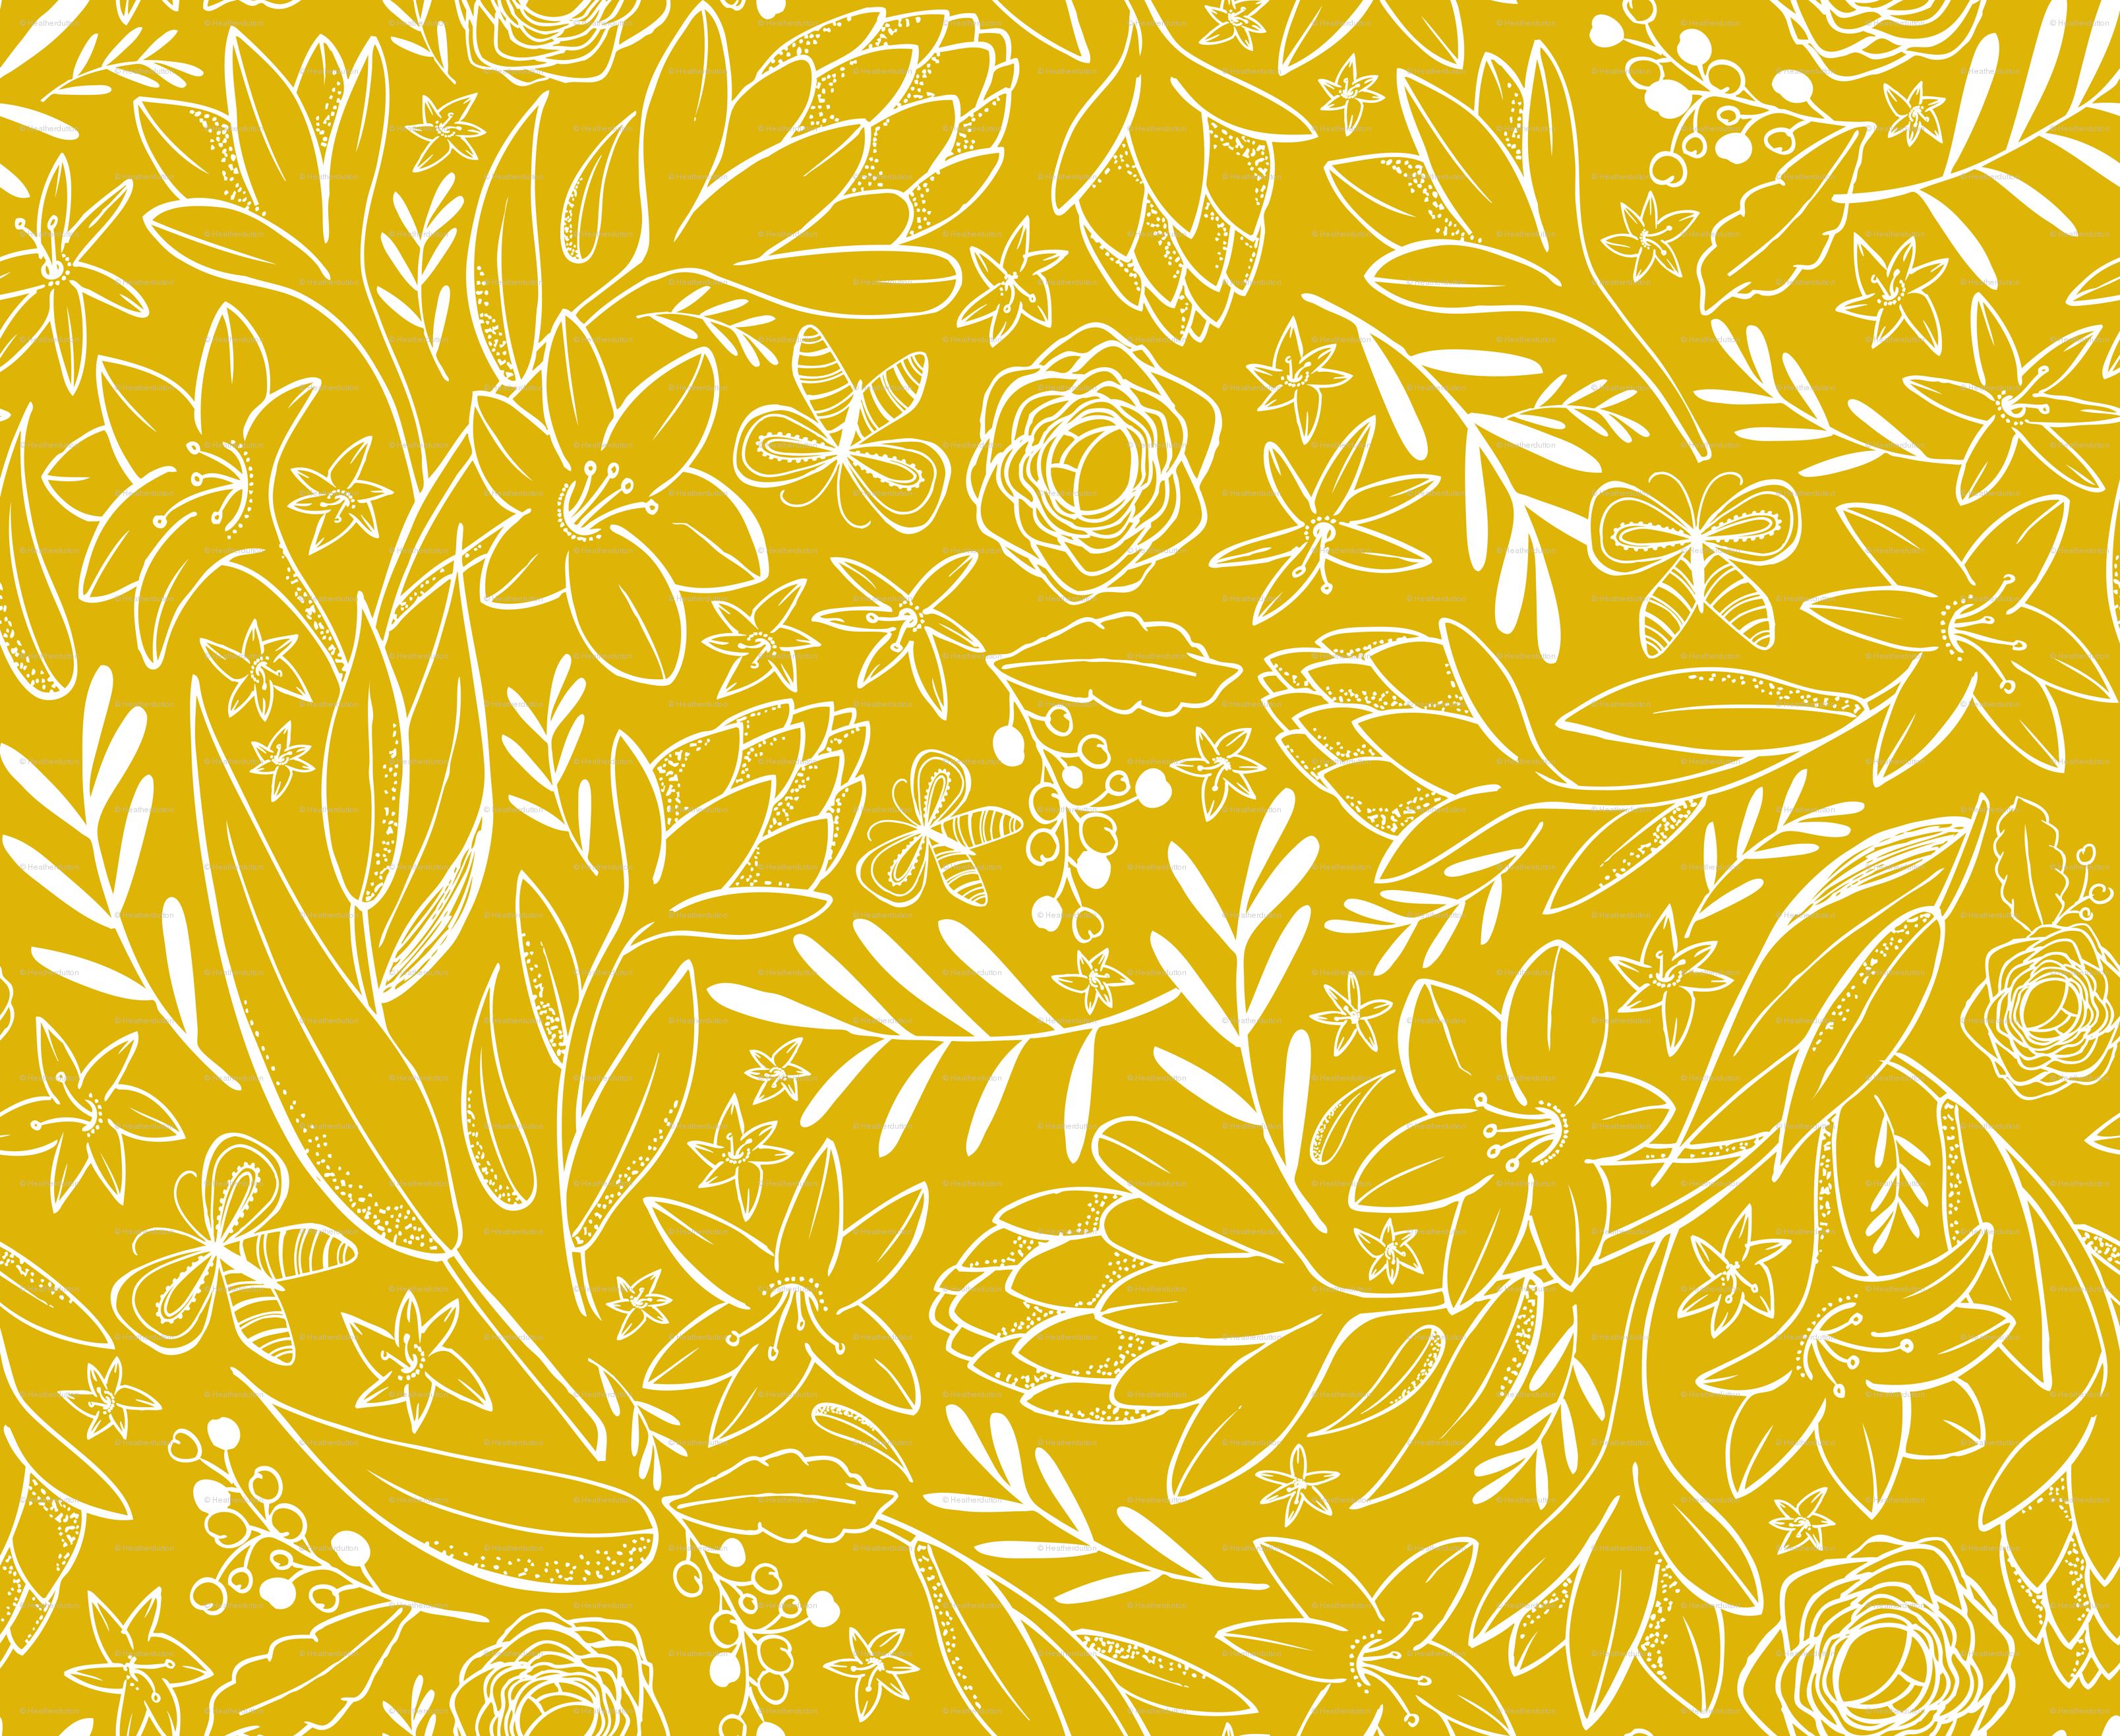 Wallpaper For Laptop Yellow